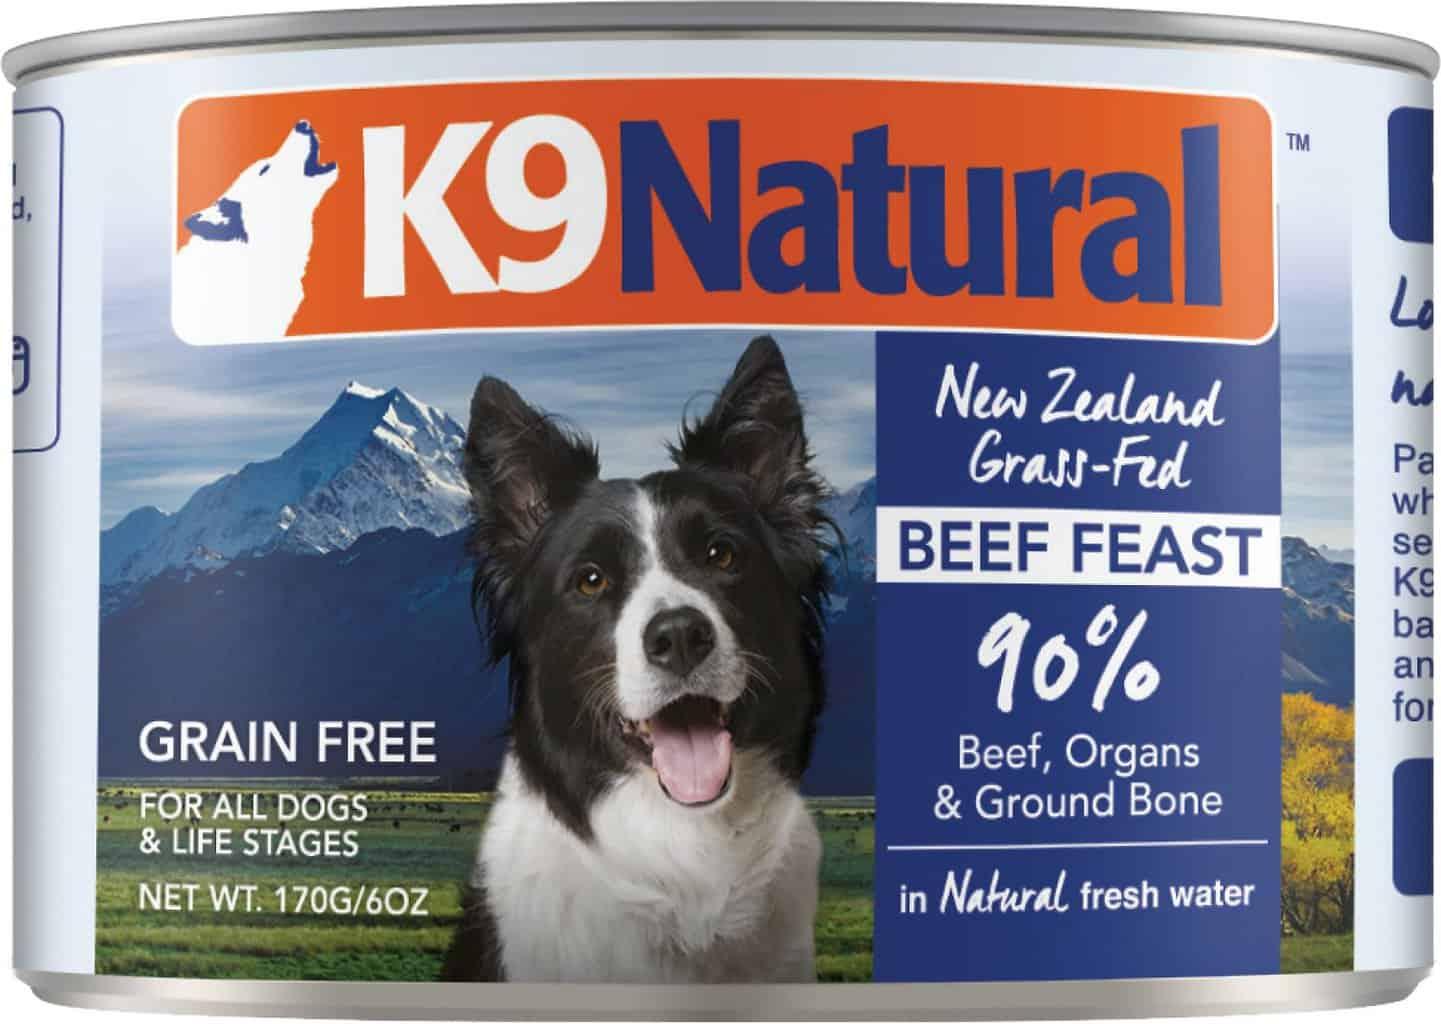 K9 Natural Dog Food Review 2021: Best Natural Pet Food? 19